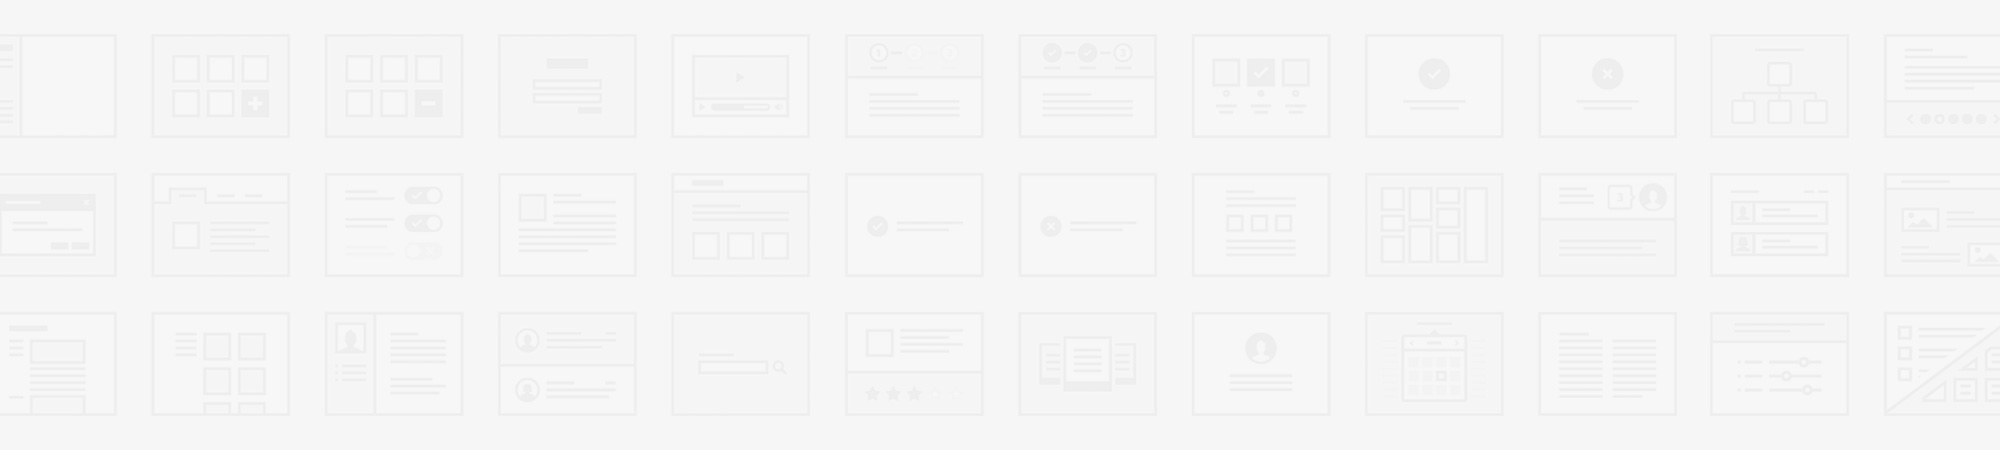 layouts-slide